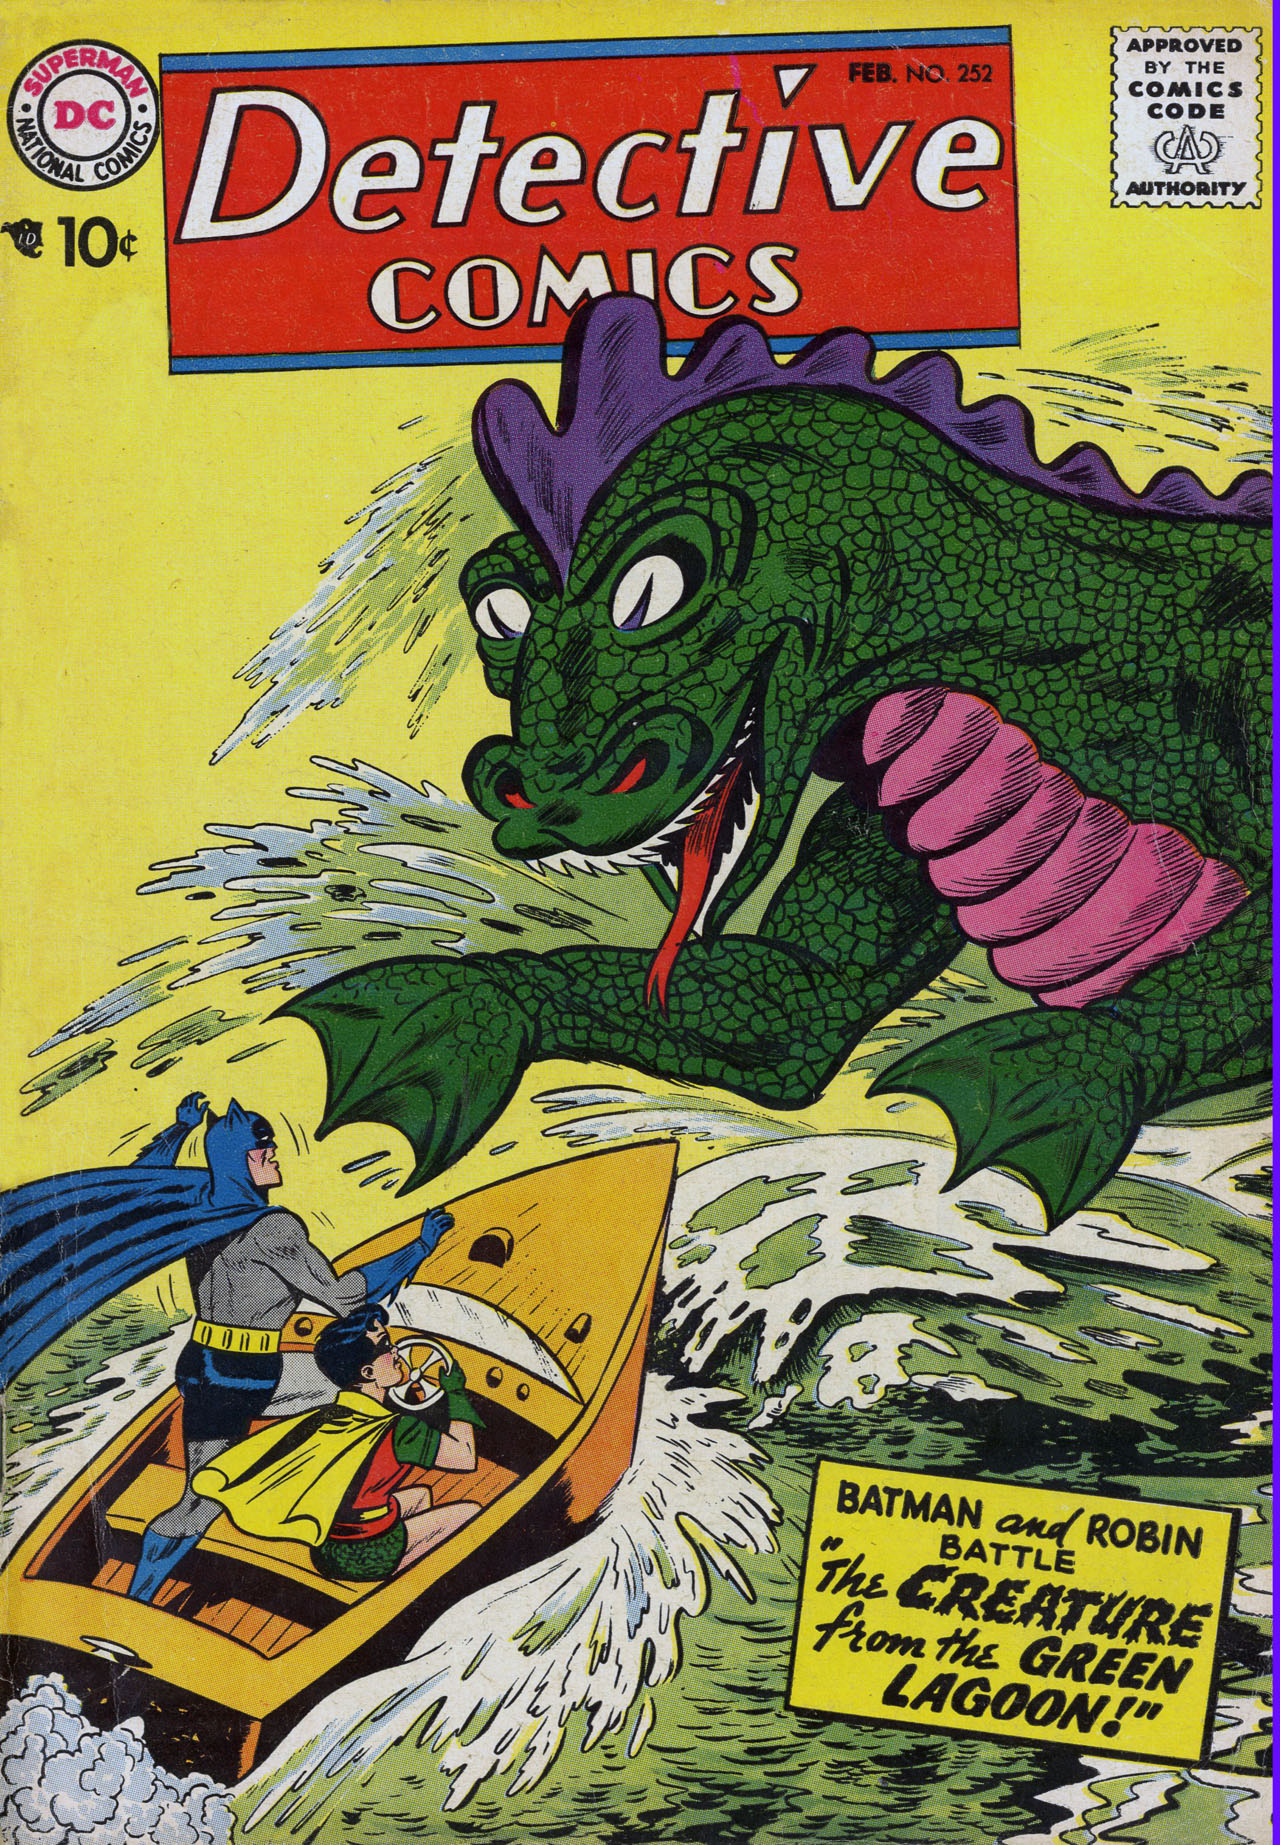 Detective Comics (1937) 252 Page 1